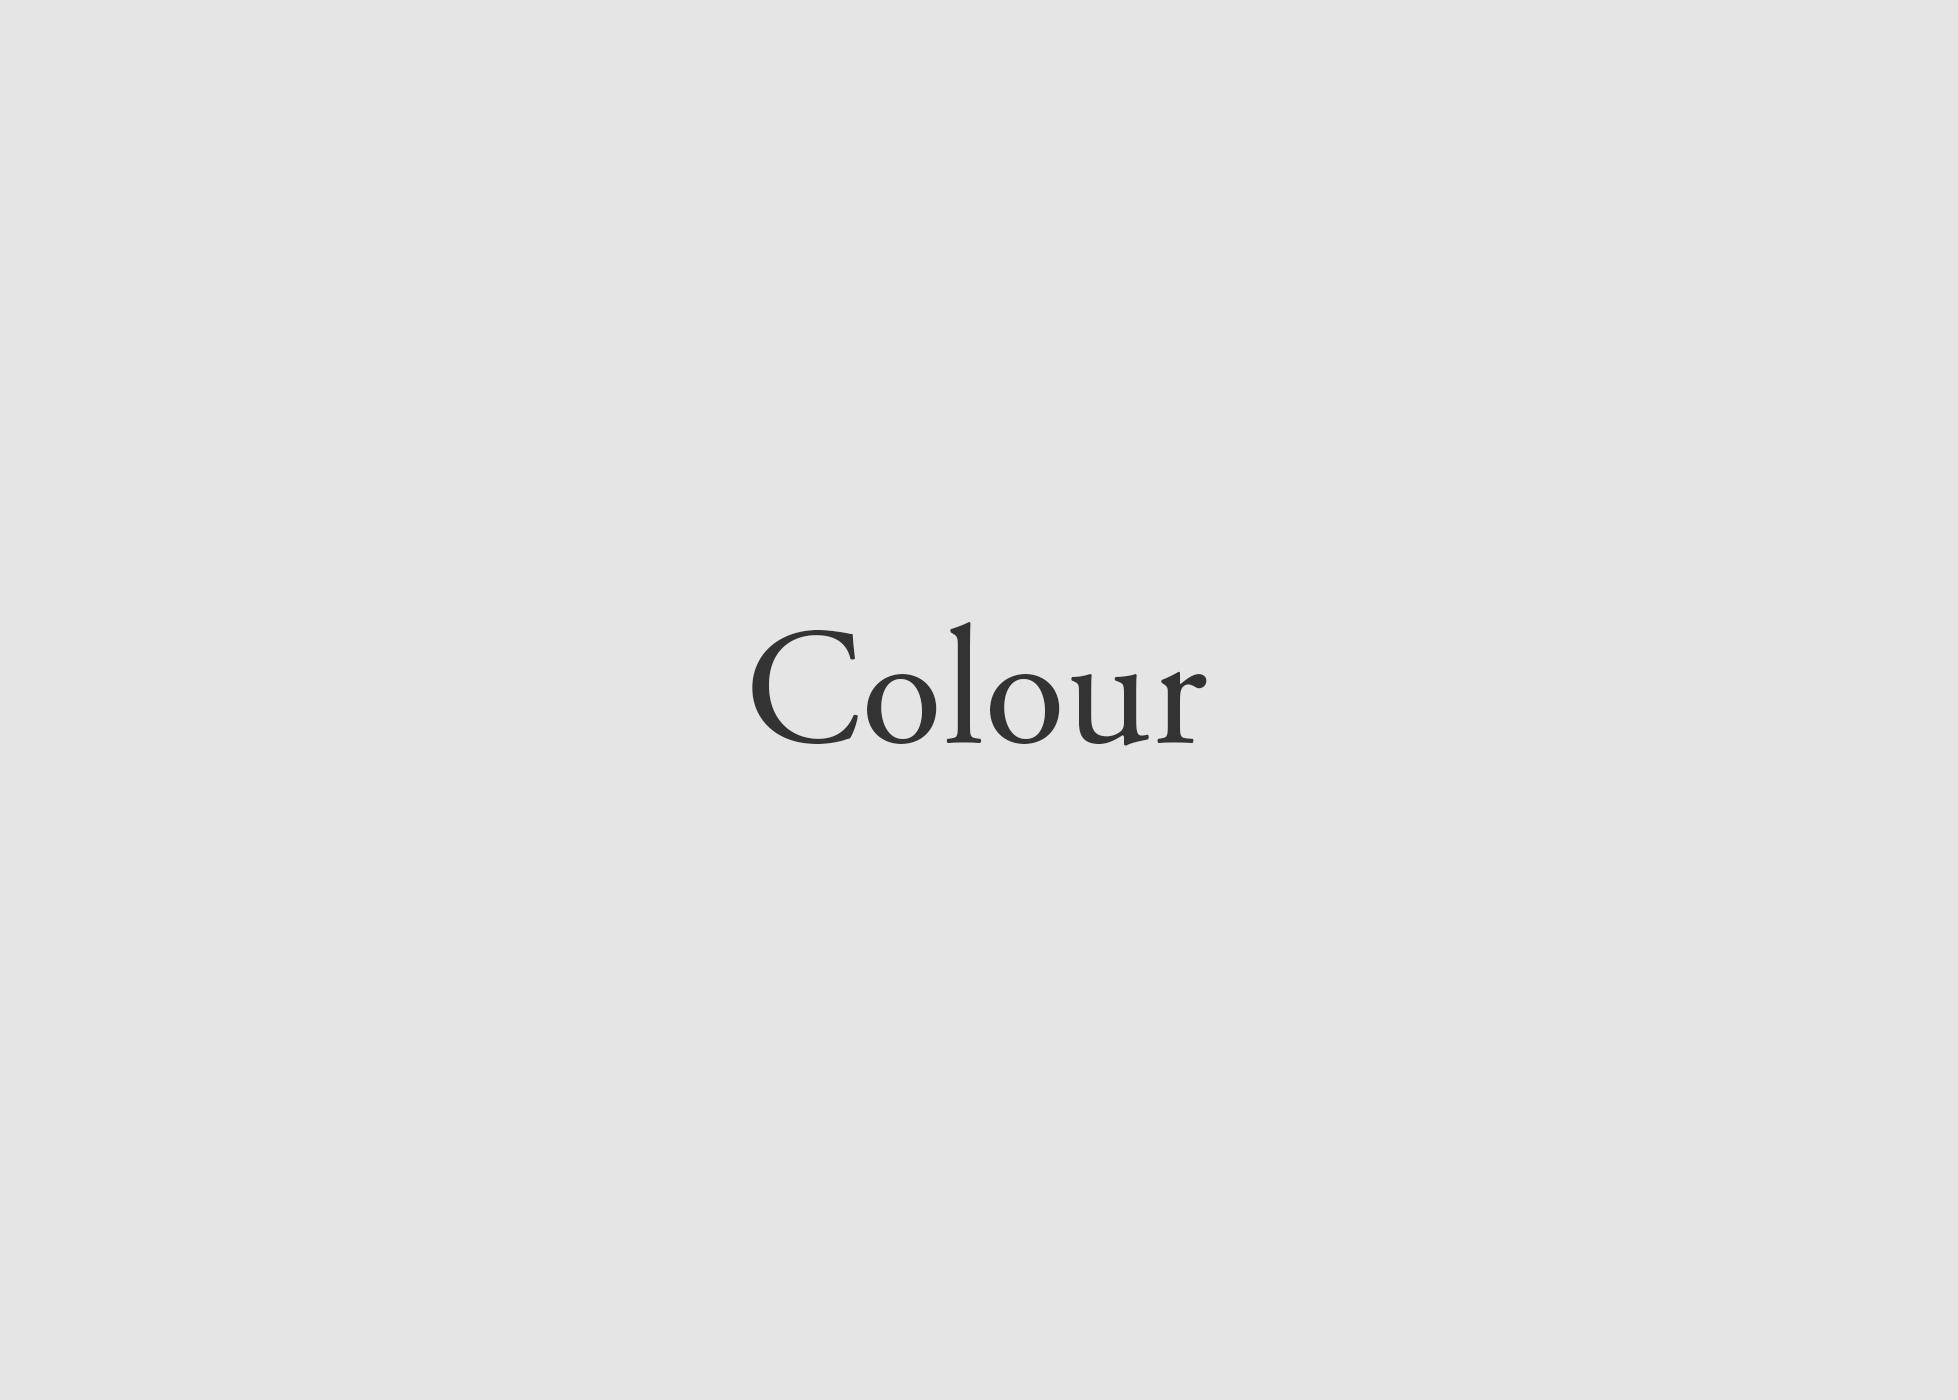 David Doing.. Colour?